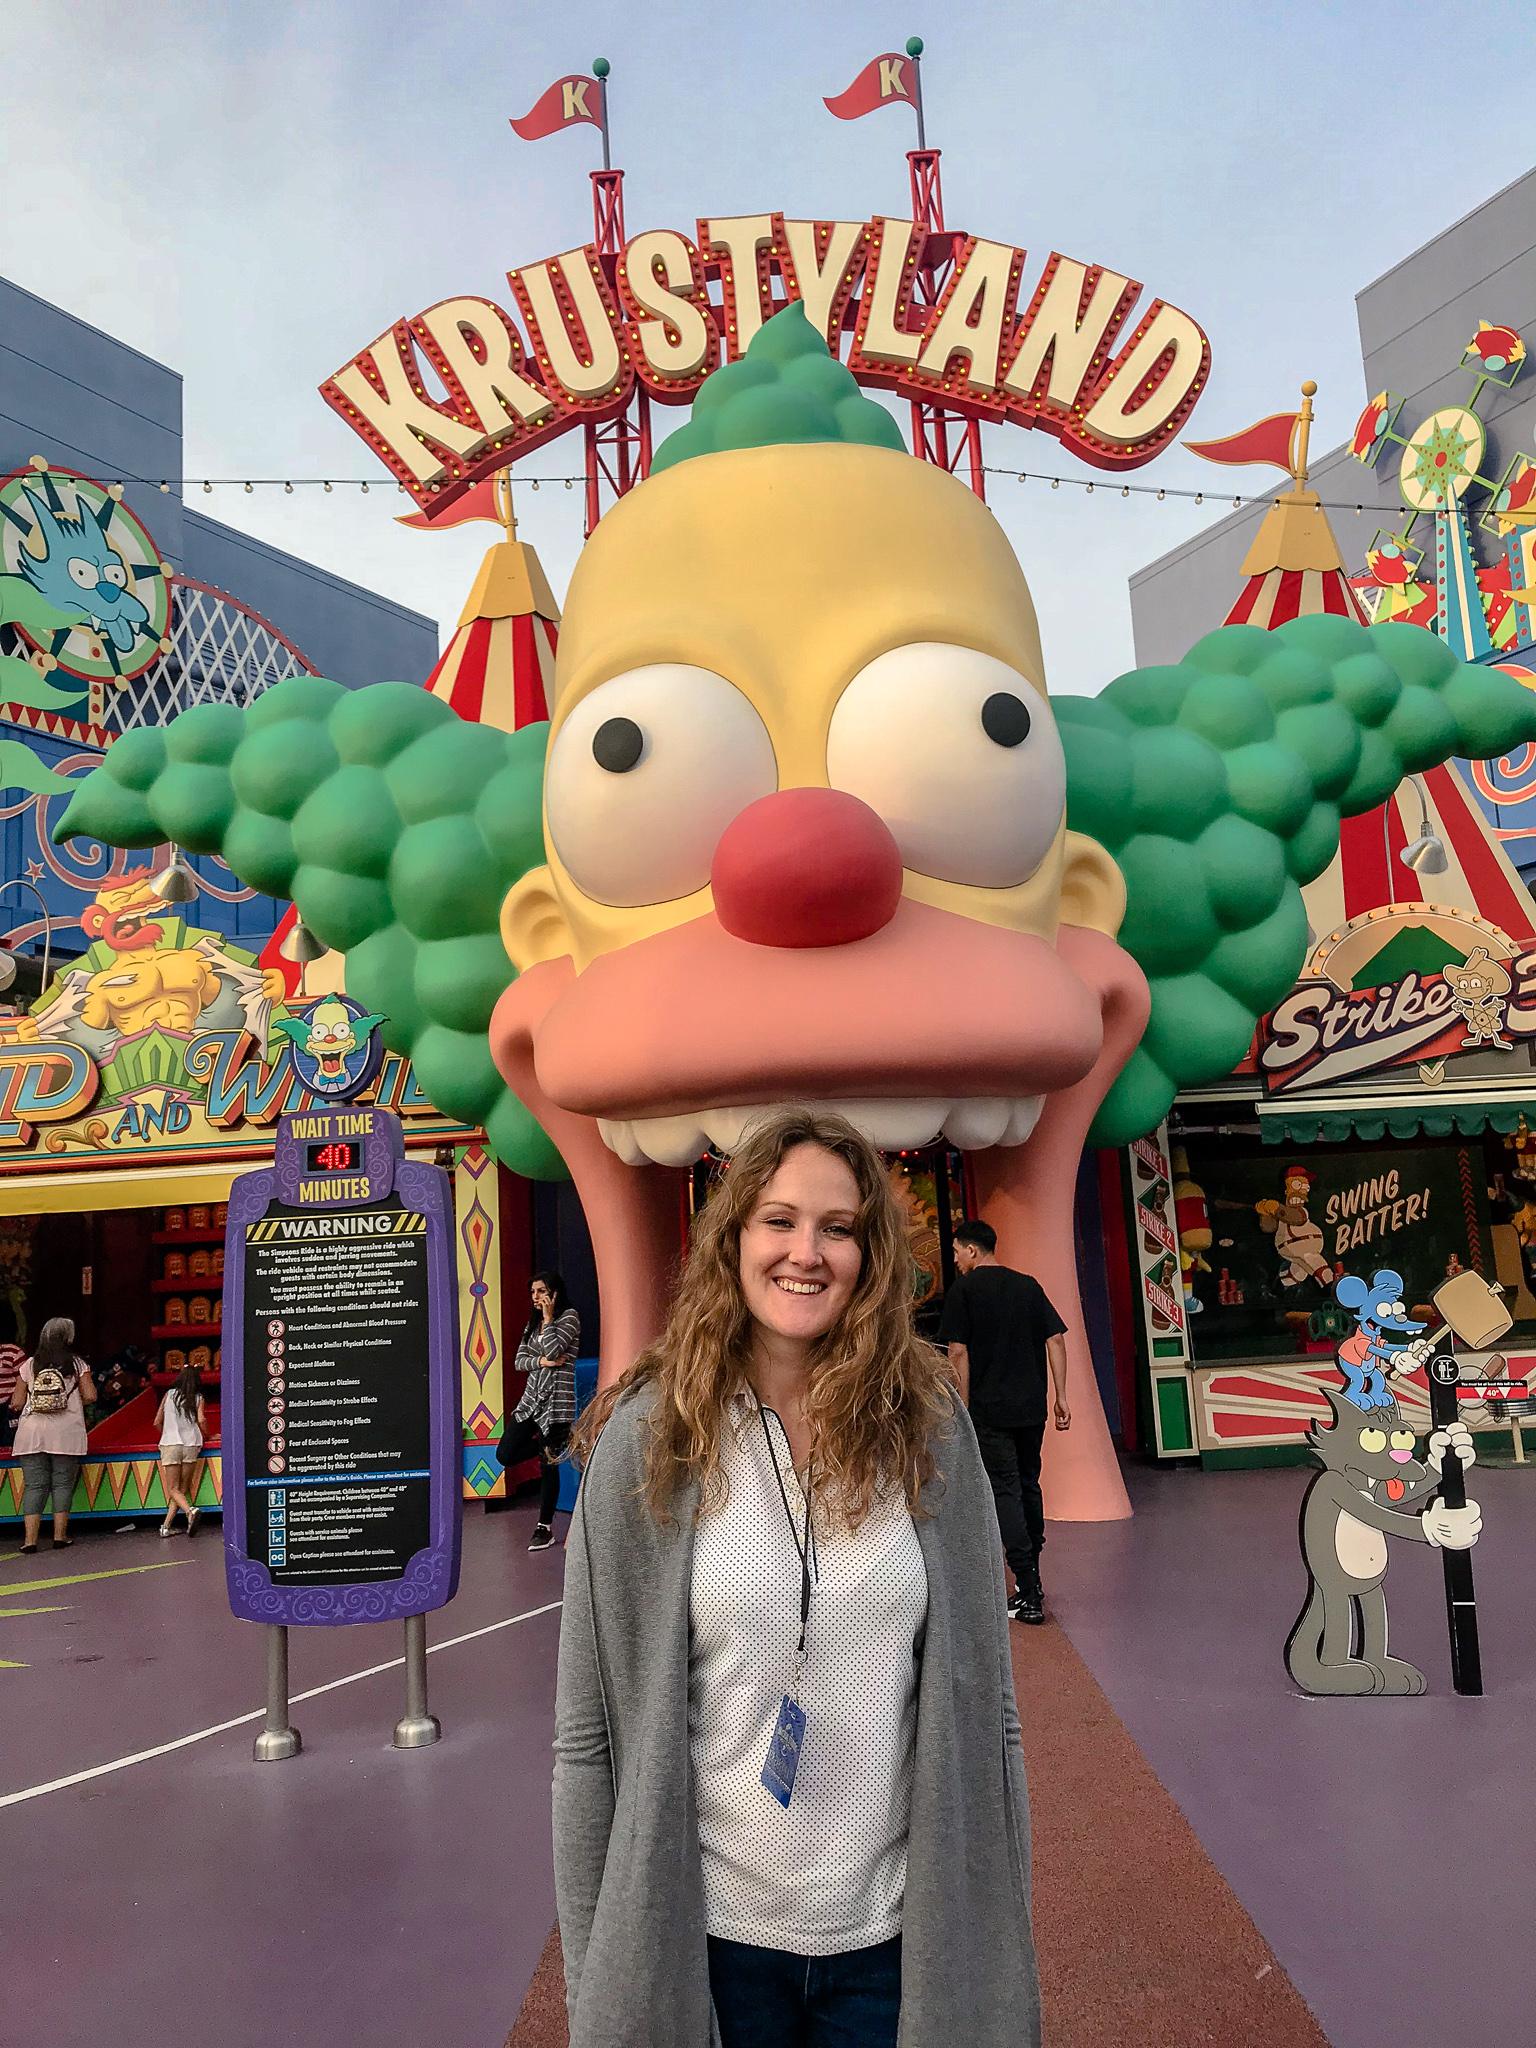 Universal Studios Hollywood Krustyland.jpg